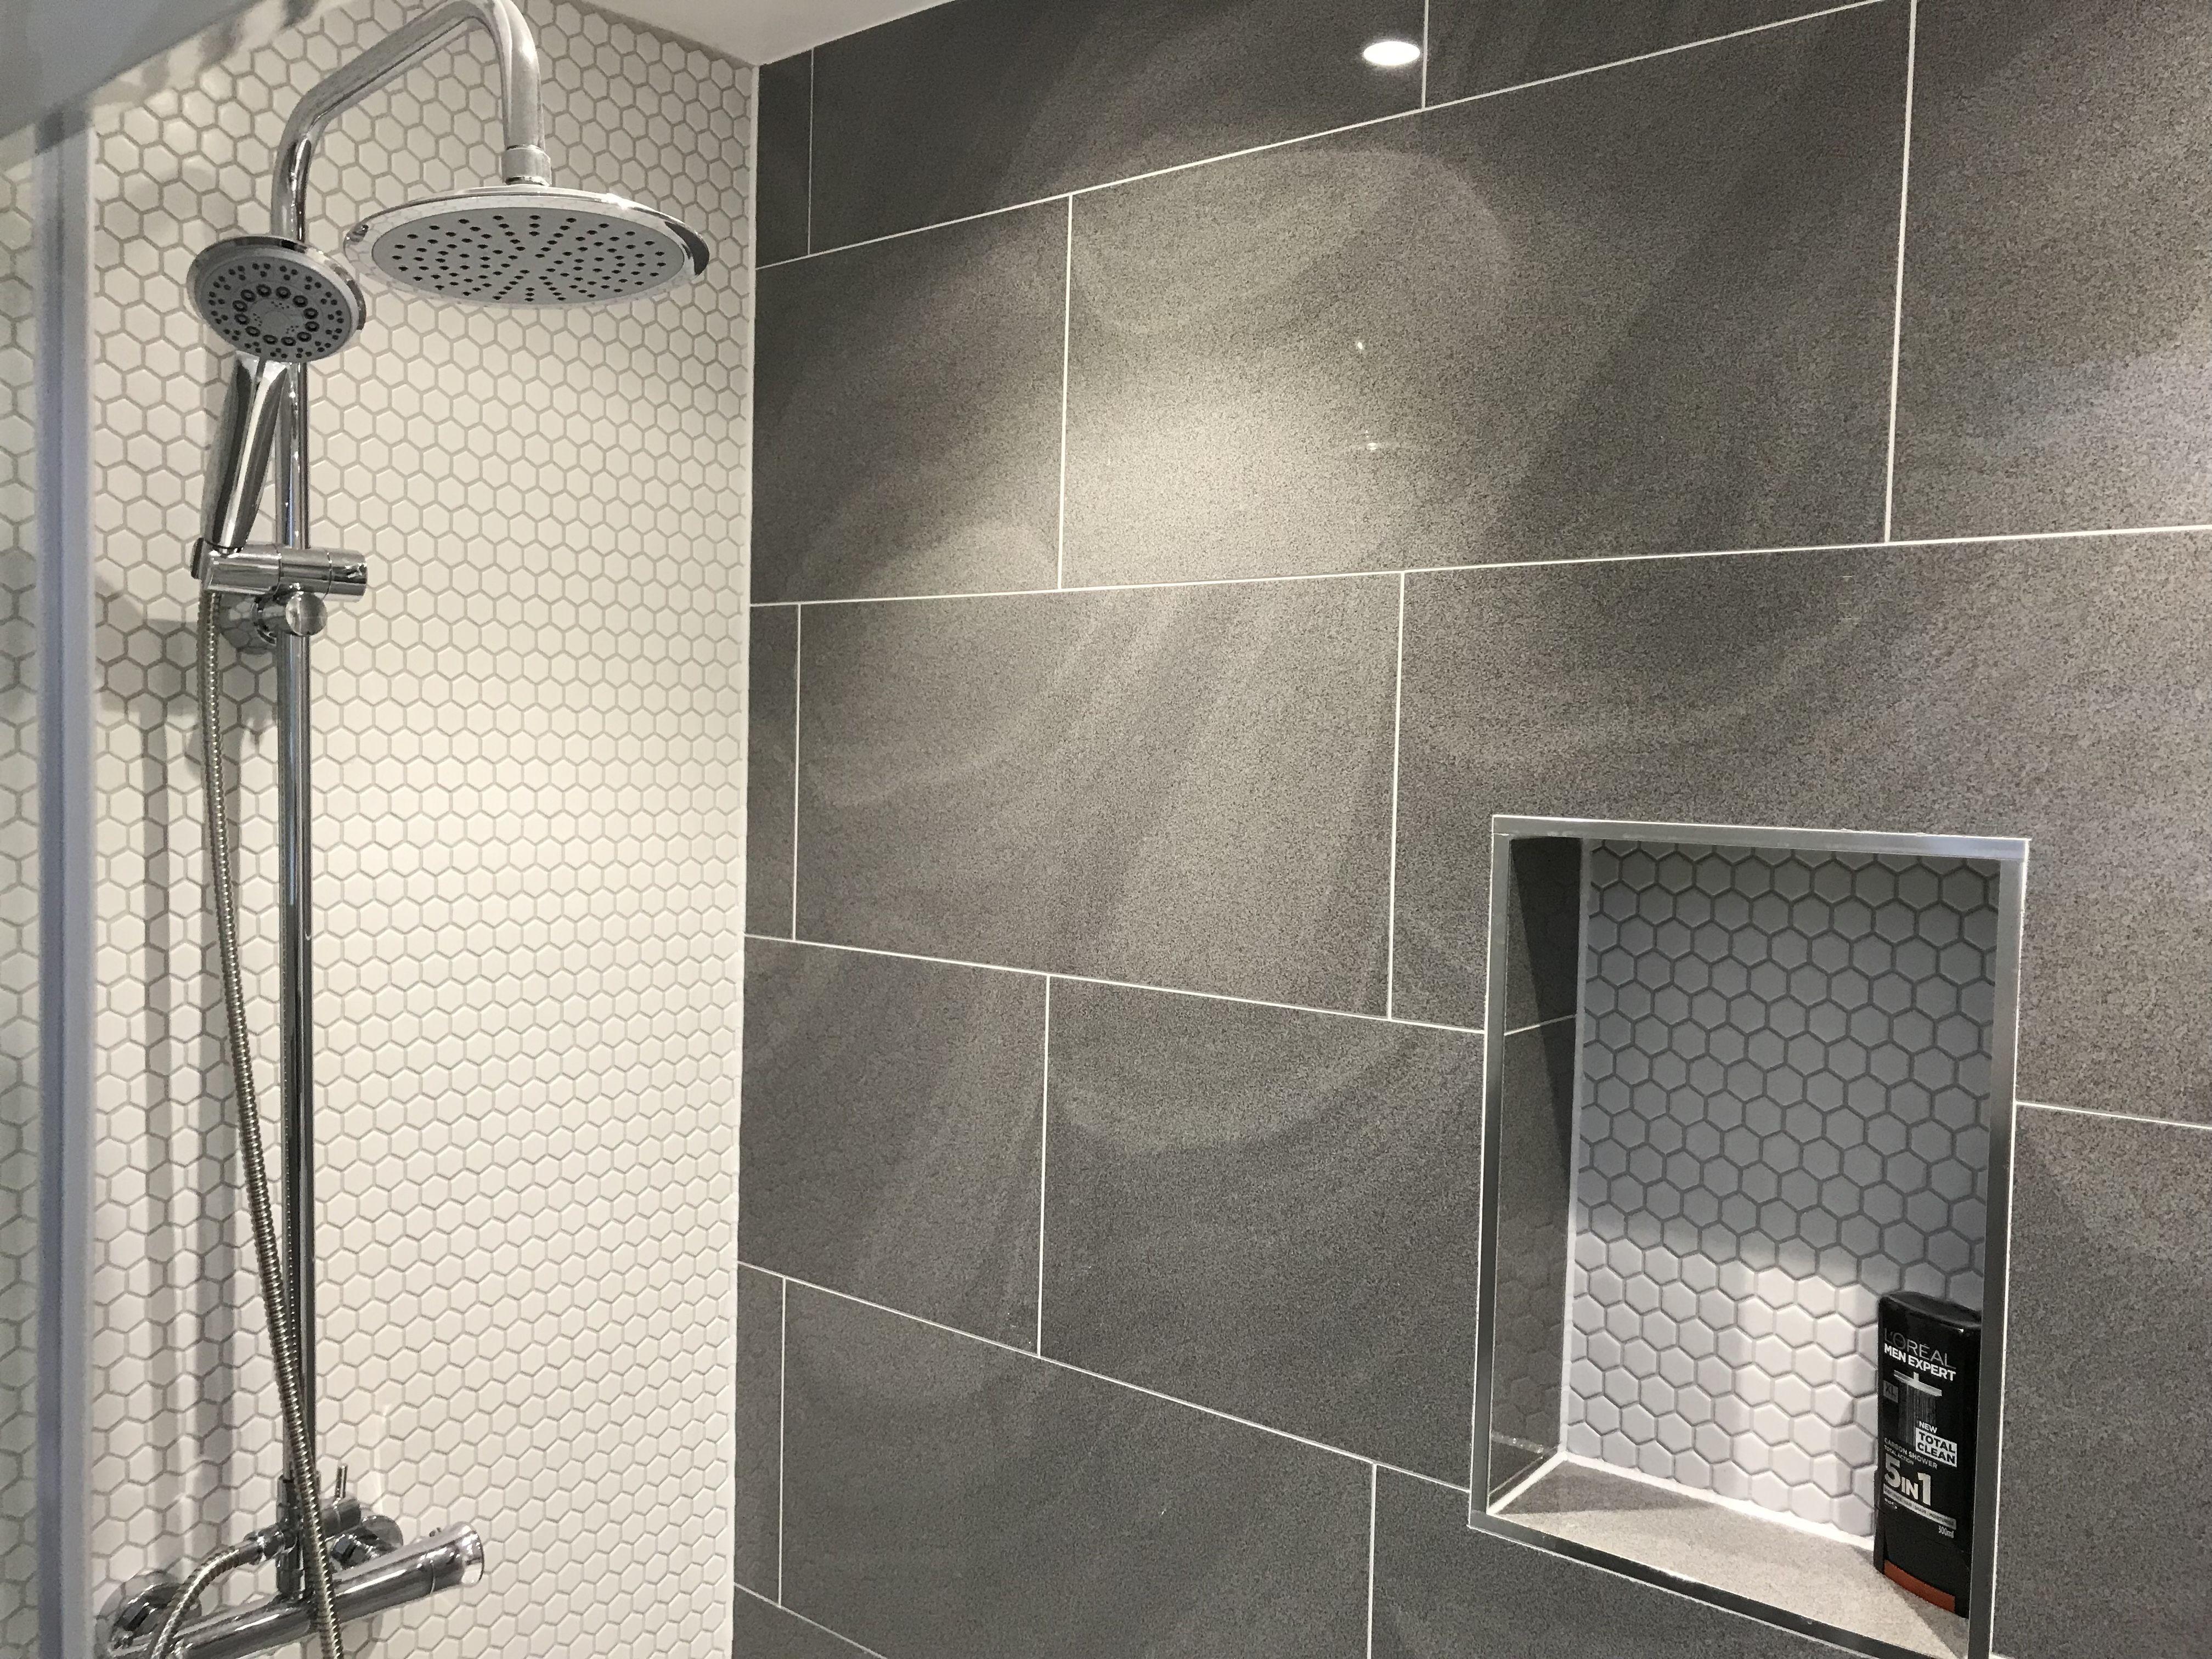 Topps Tiles Regal Wave Mist Grey Tiles And White Mosaics Bathroom Remodel Master Loft Bathroom Tile Bathroom